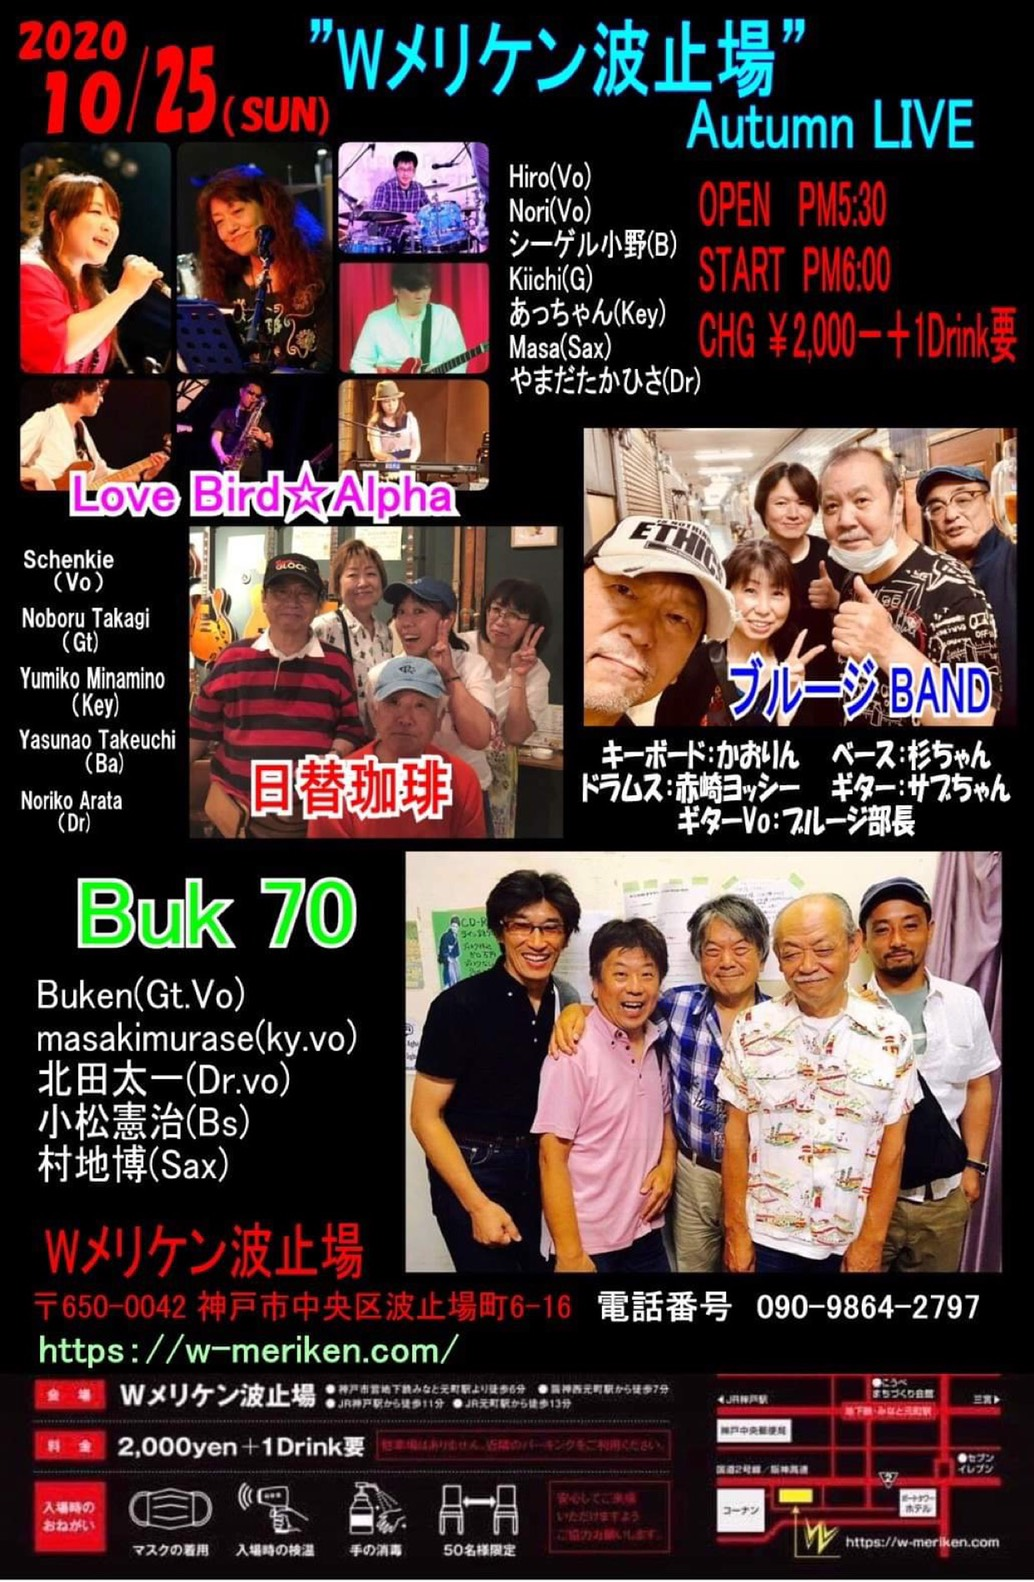 """Wメリケン波止場""Autumn Live"